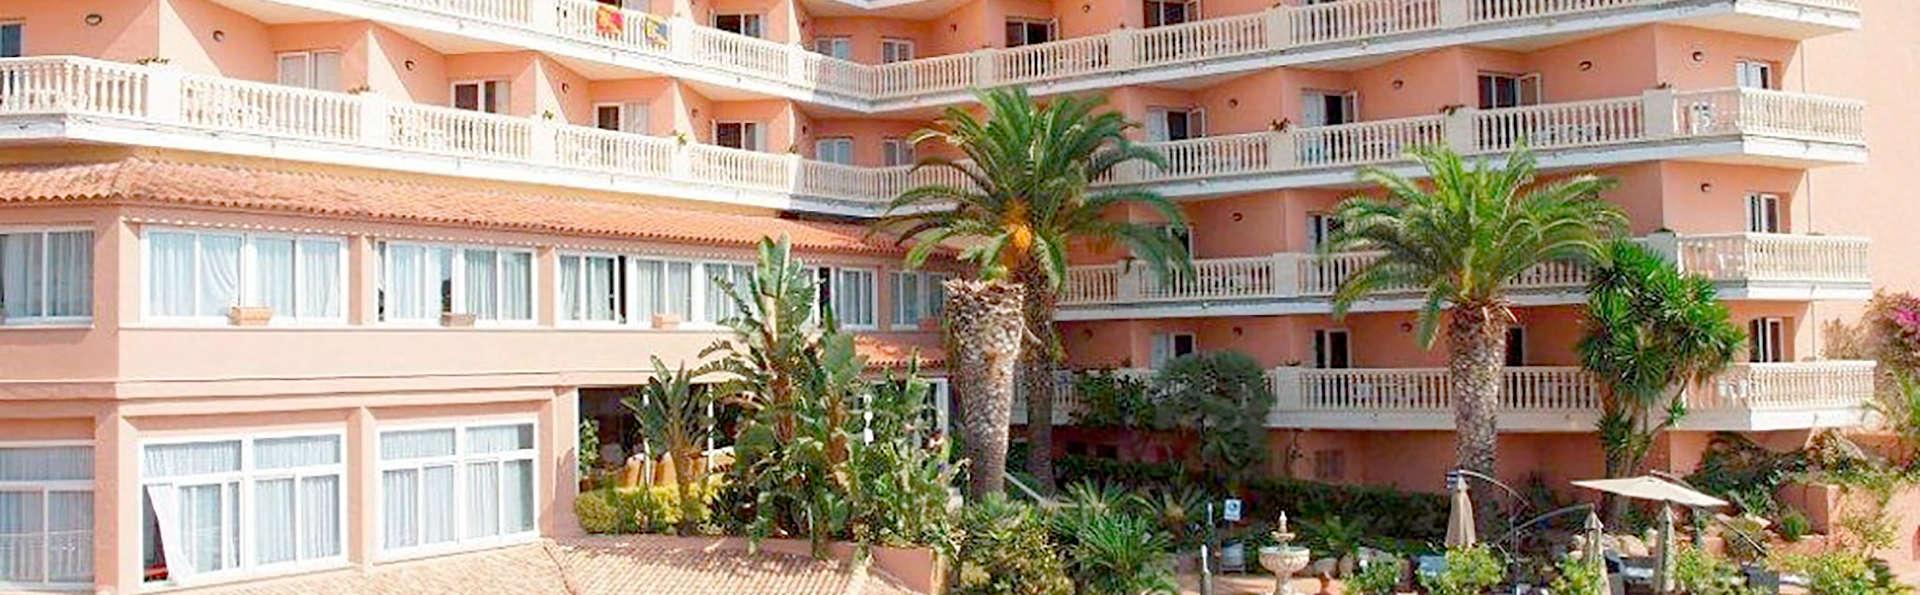 Hotel Alba Seleqtta - Edit_Front2.jpg